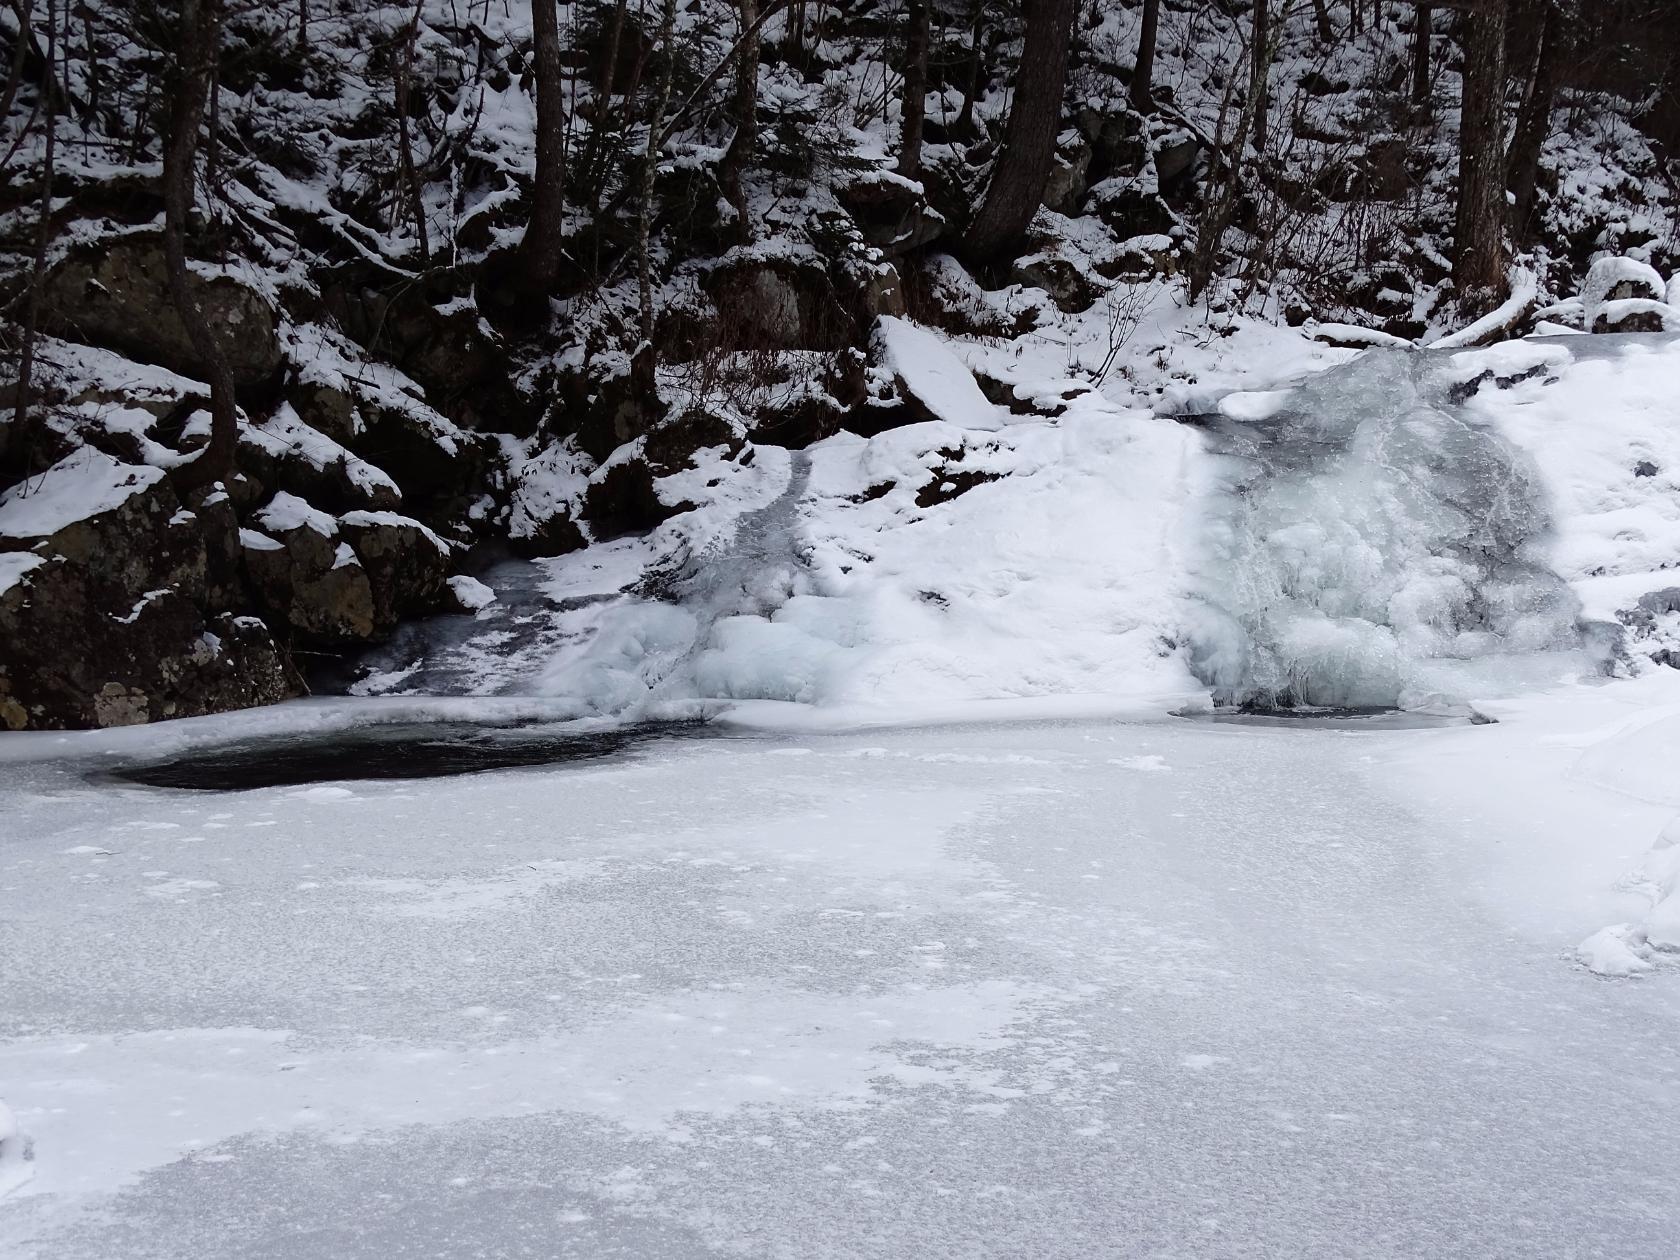 Водопад Трехголовый наполовину подо льдом